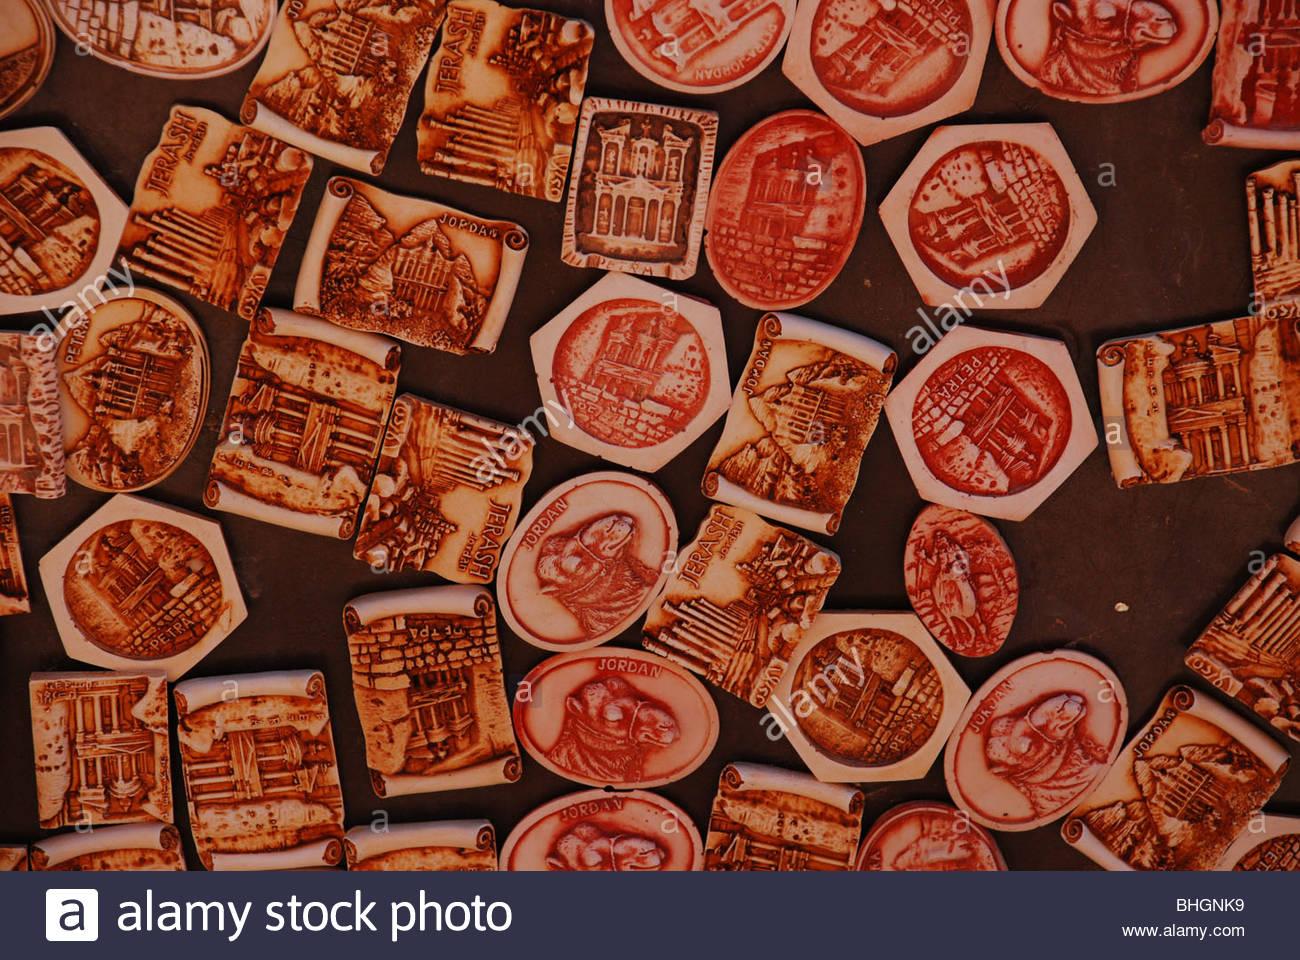 A display of fridge magnets showing an assortment of images Petra Jordan Stock Photo